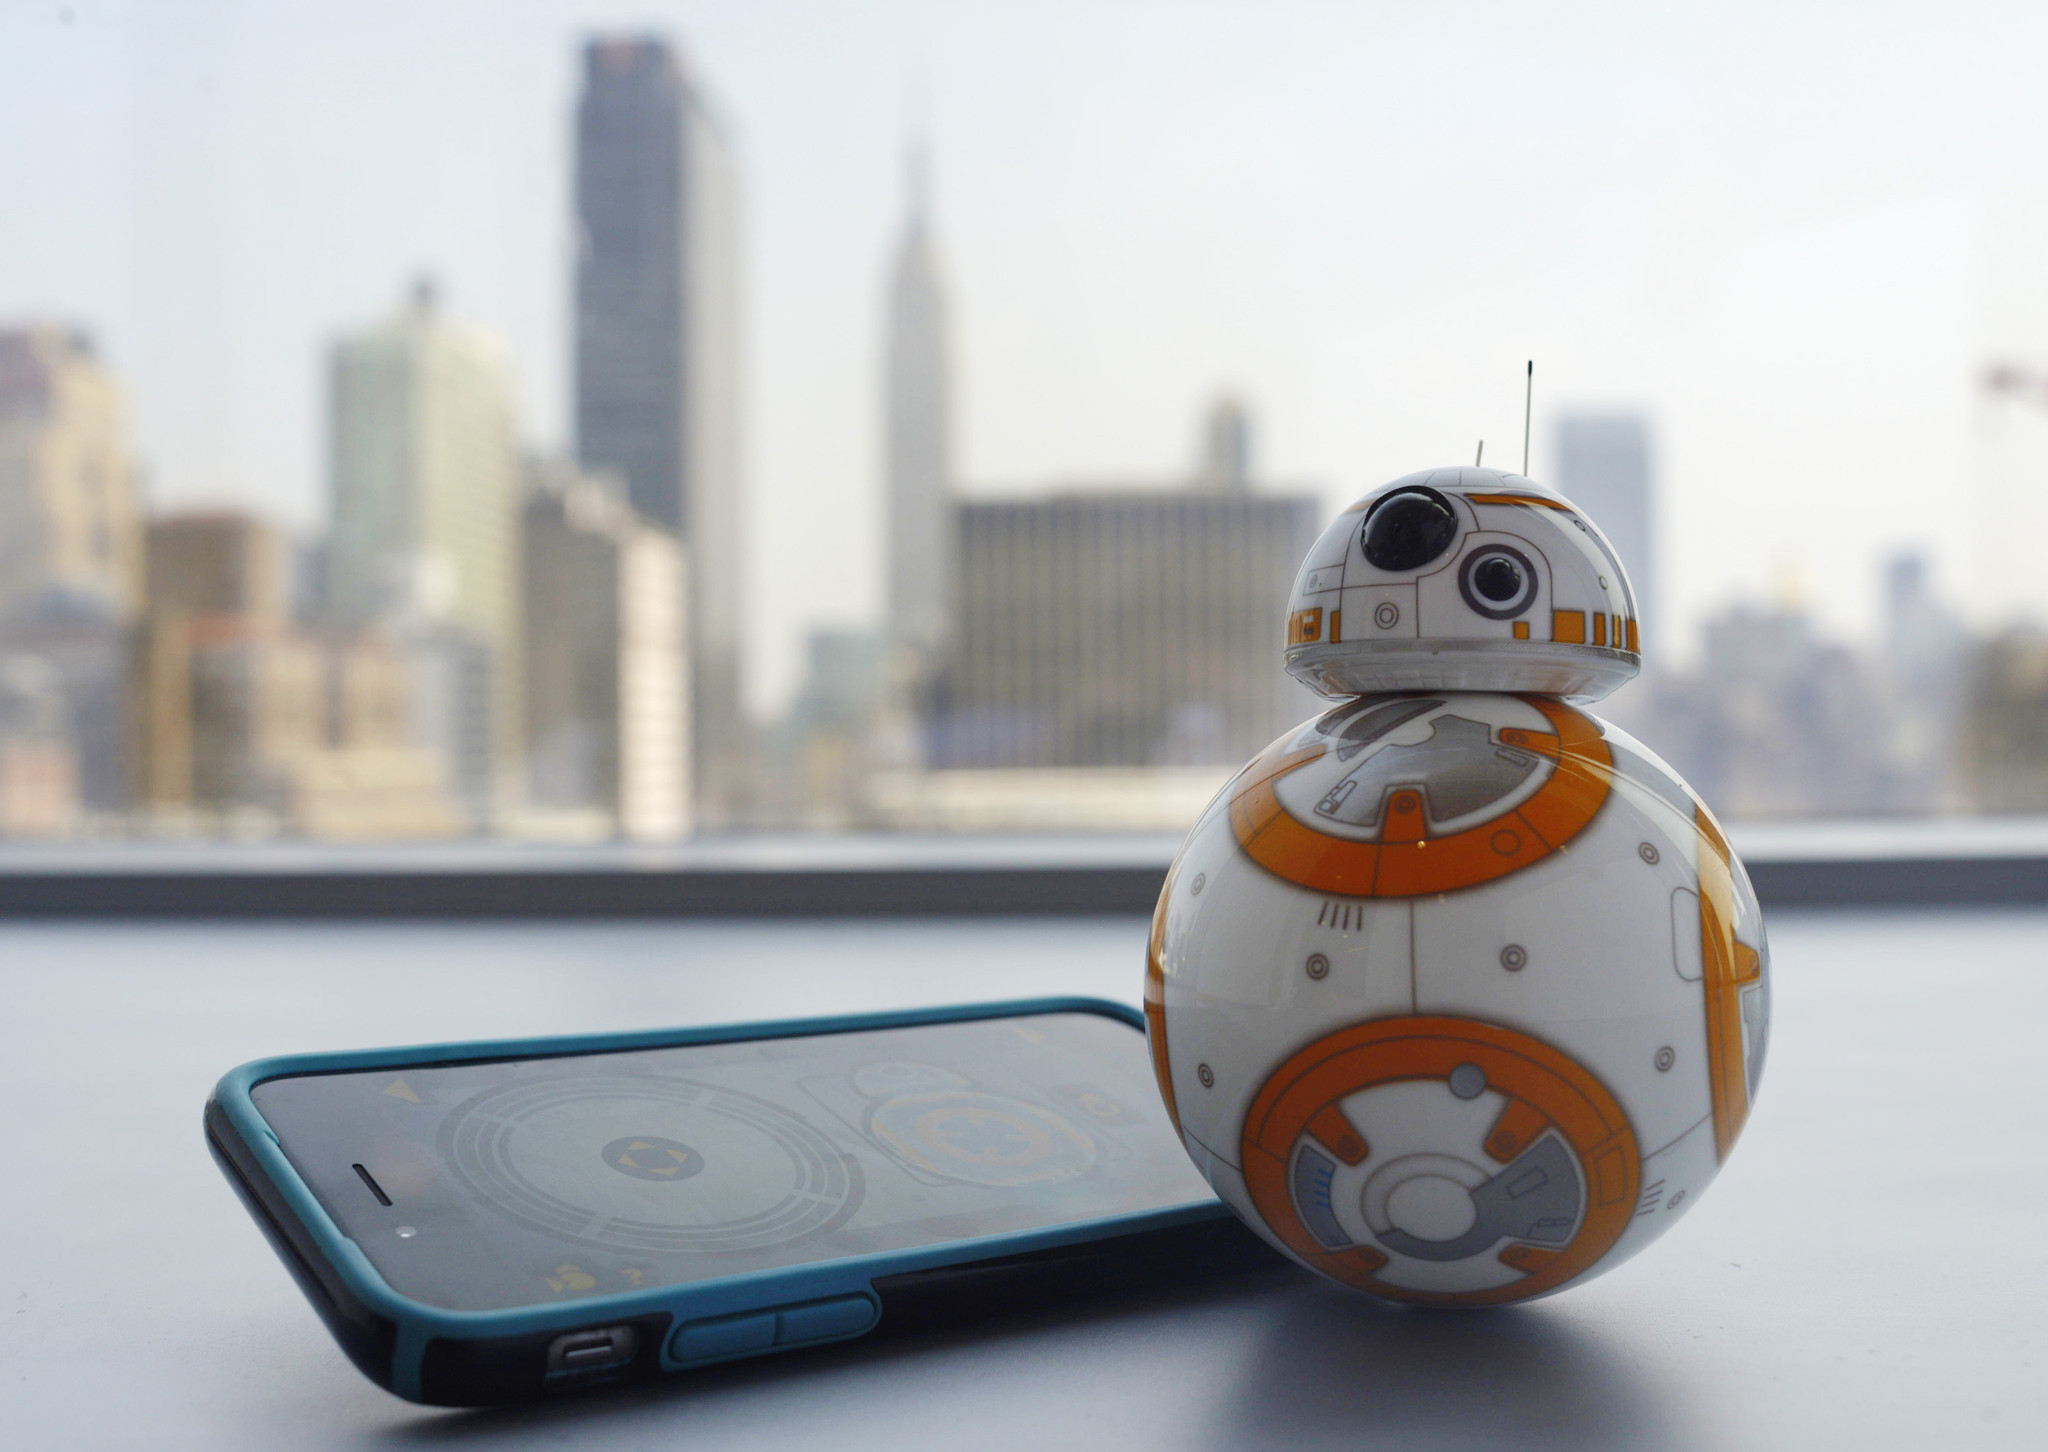 Disney offering partial refunds for too pricey star wars robot orlando sentinel - Robot blanc star wars ...